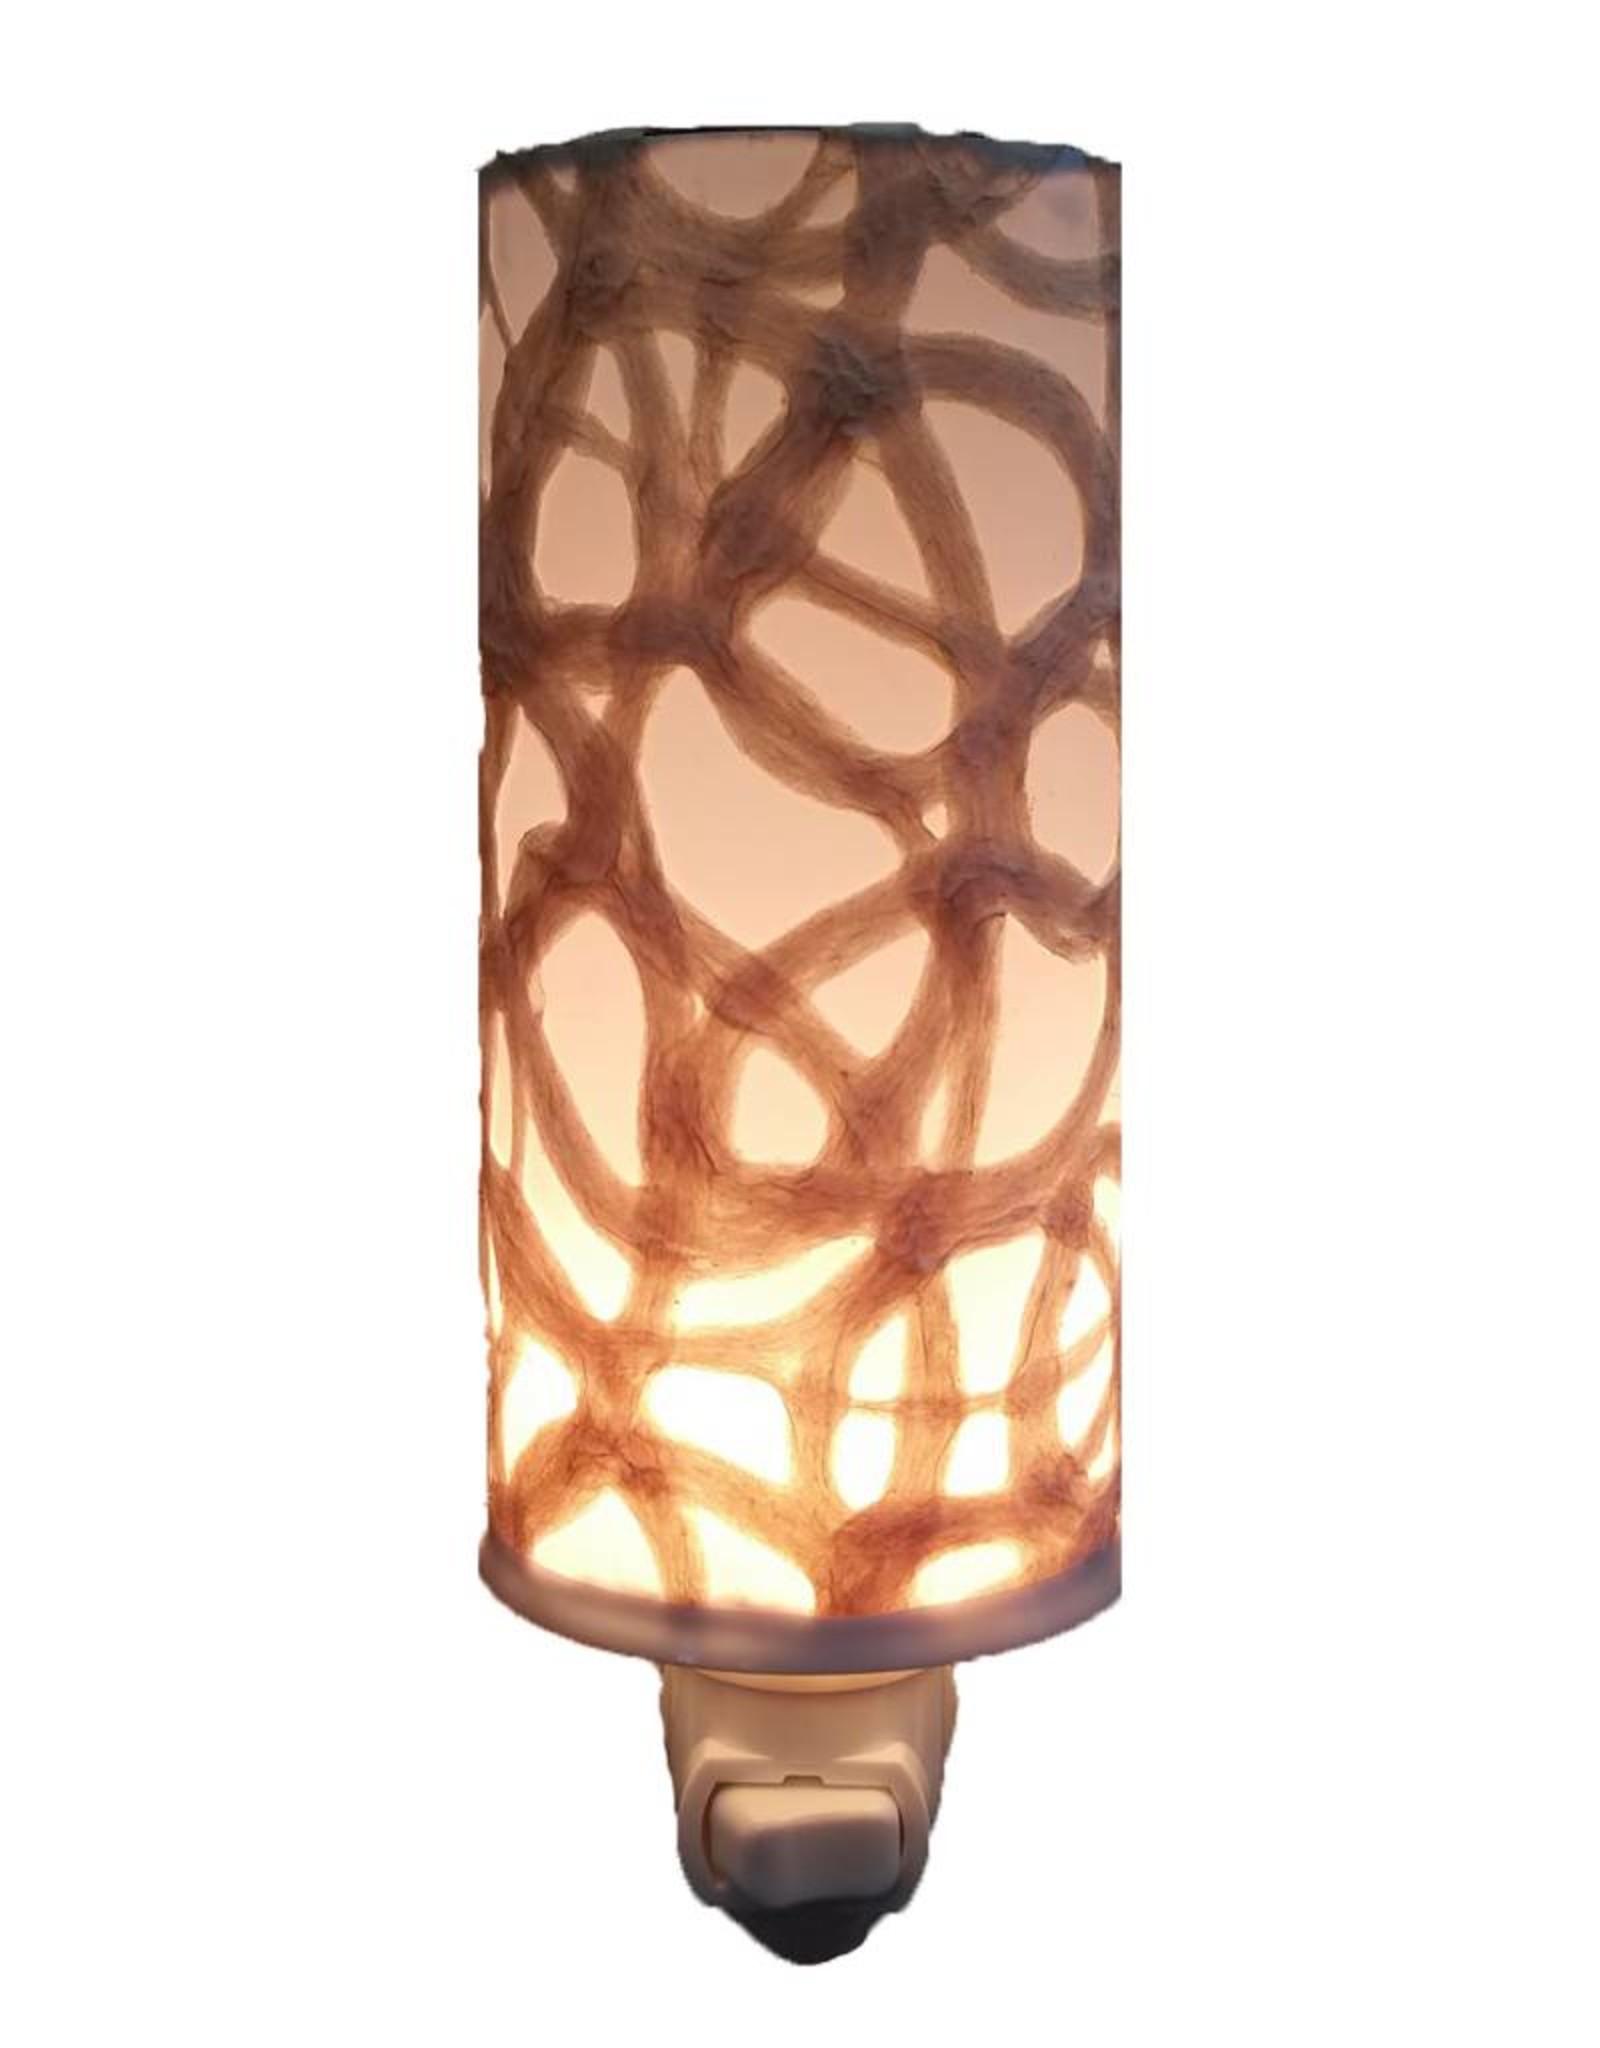 Eangee Paper Nightlight Swirl